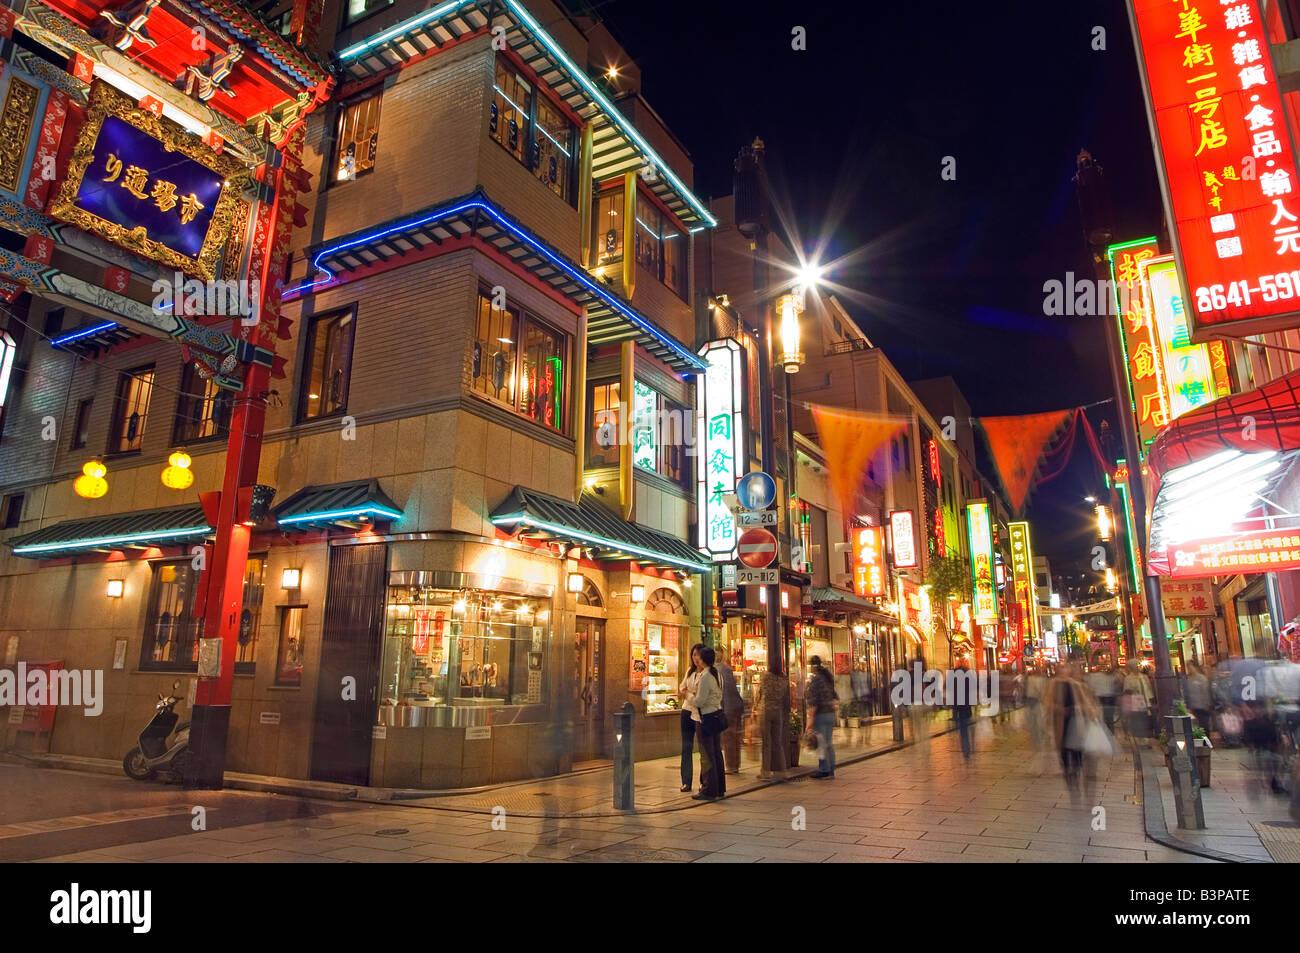 Japan, Kanagawa prefecture, China town. Yokohama, China town at night - Stock Image